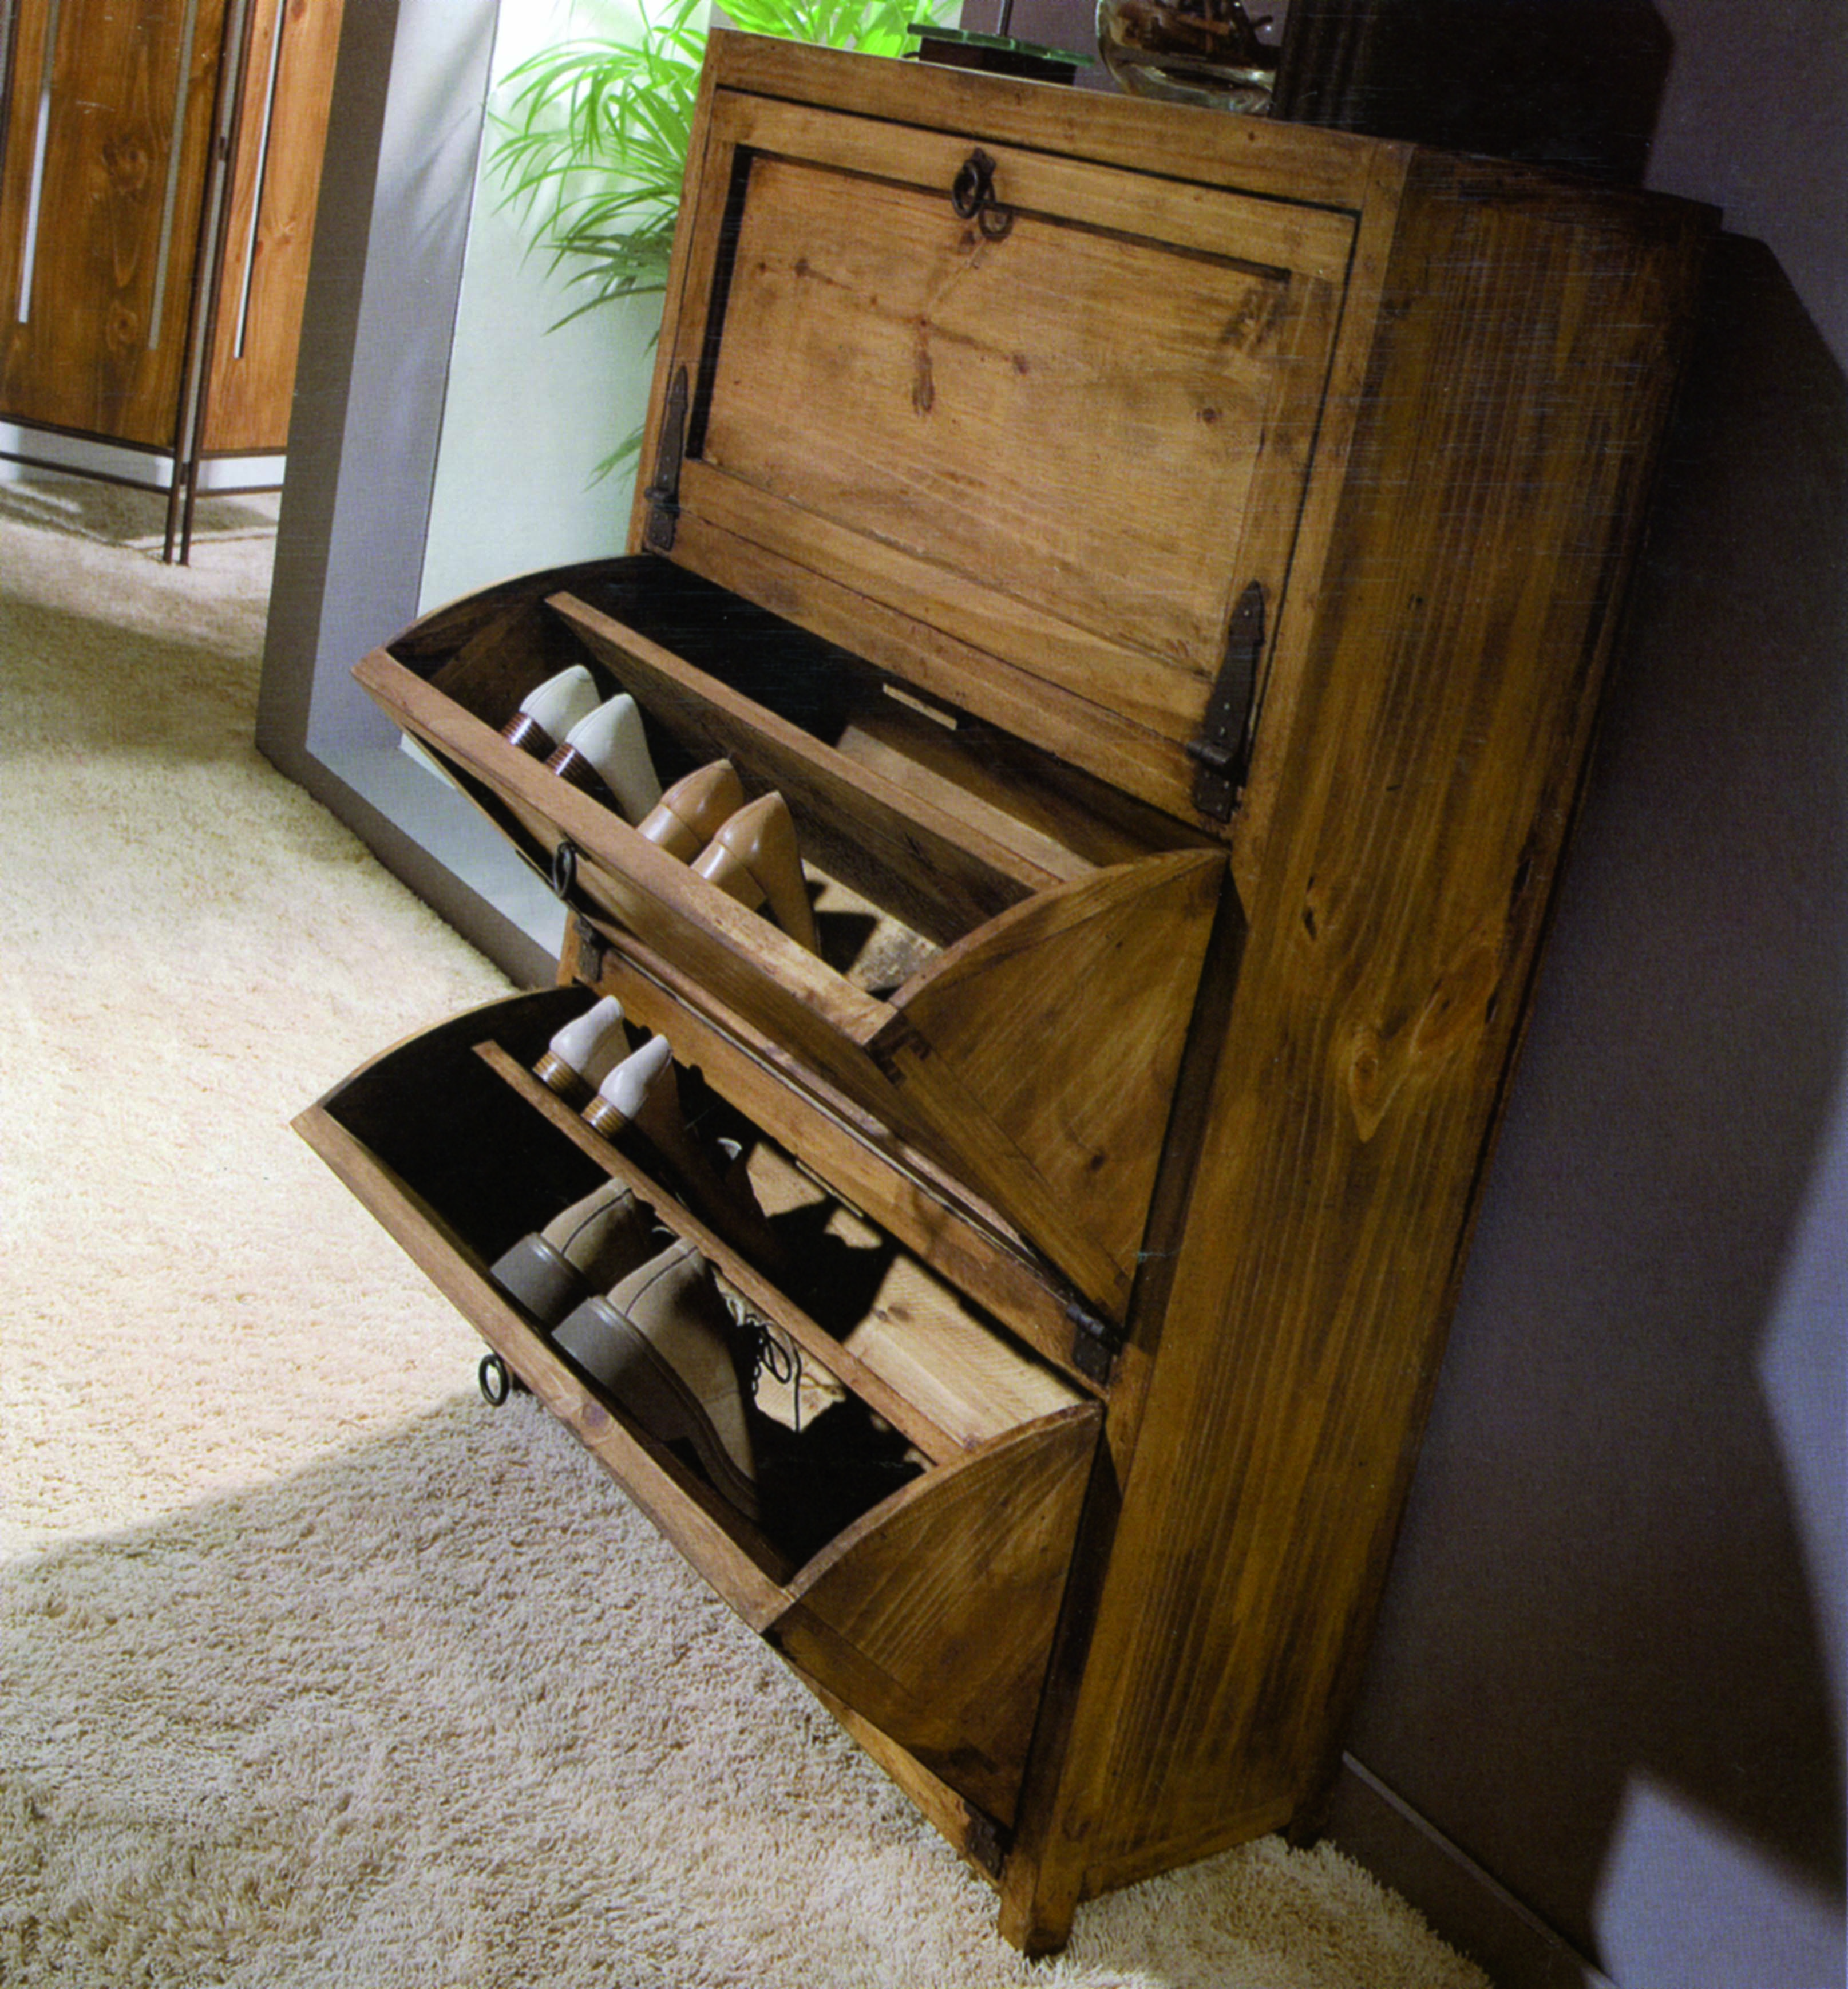 Mueble zapatero artesanal 20170818234258 for Modelos de zapateros de madera